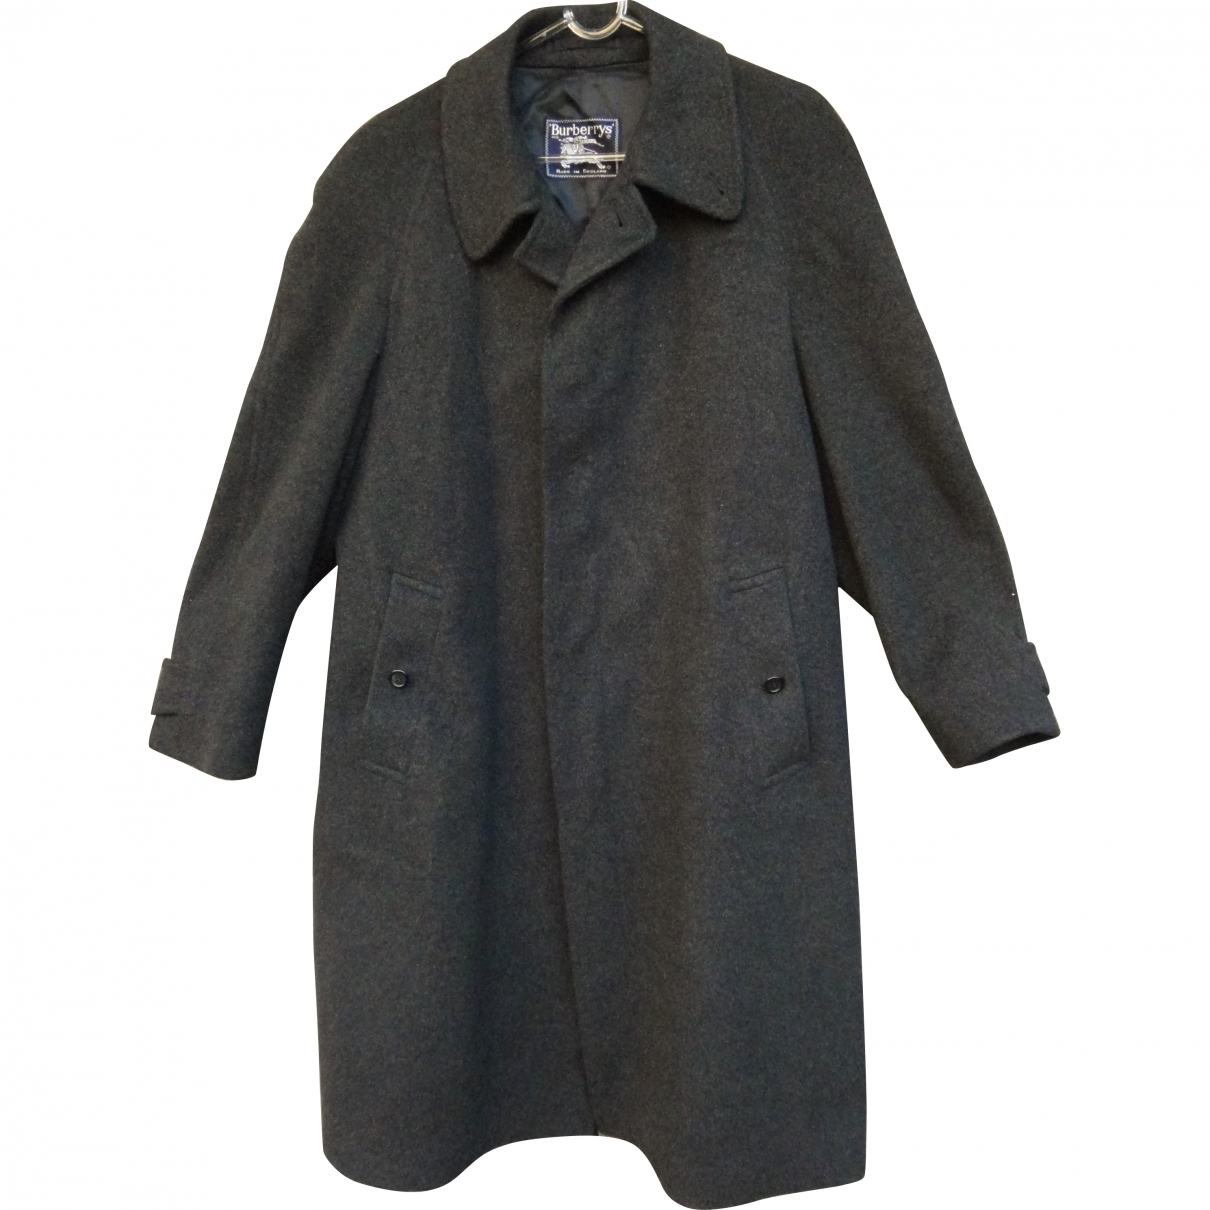 Burberry \N Maentel in  Grau Wolle